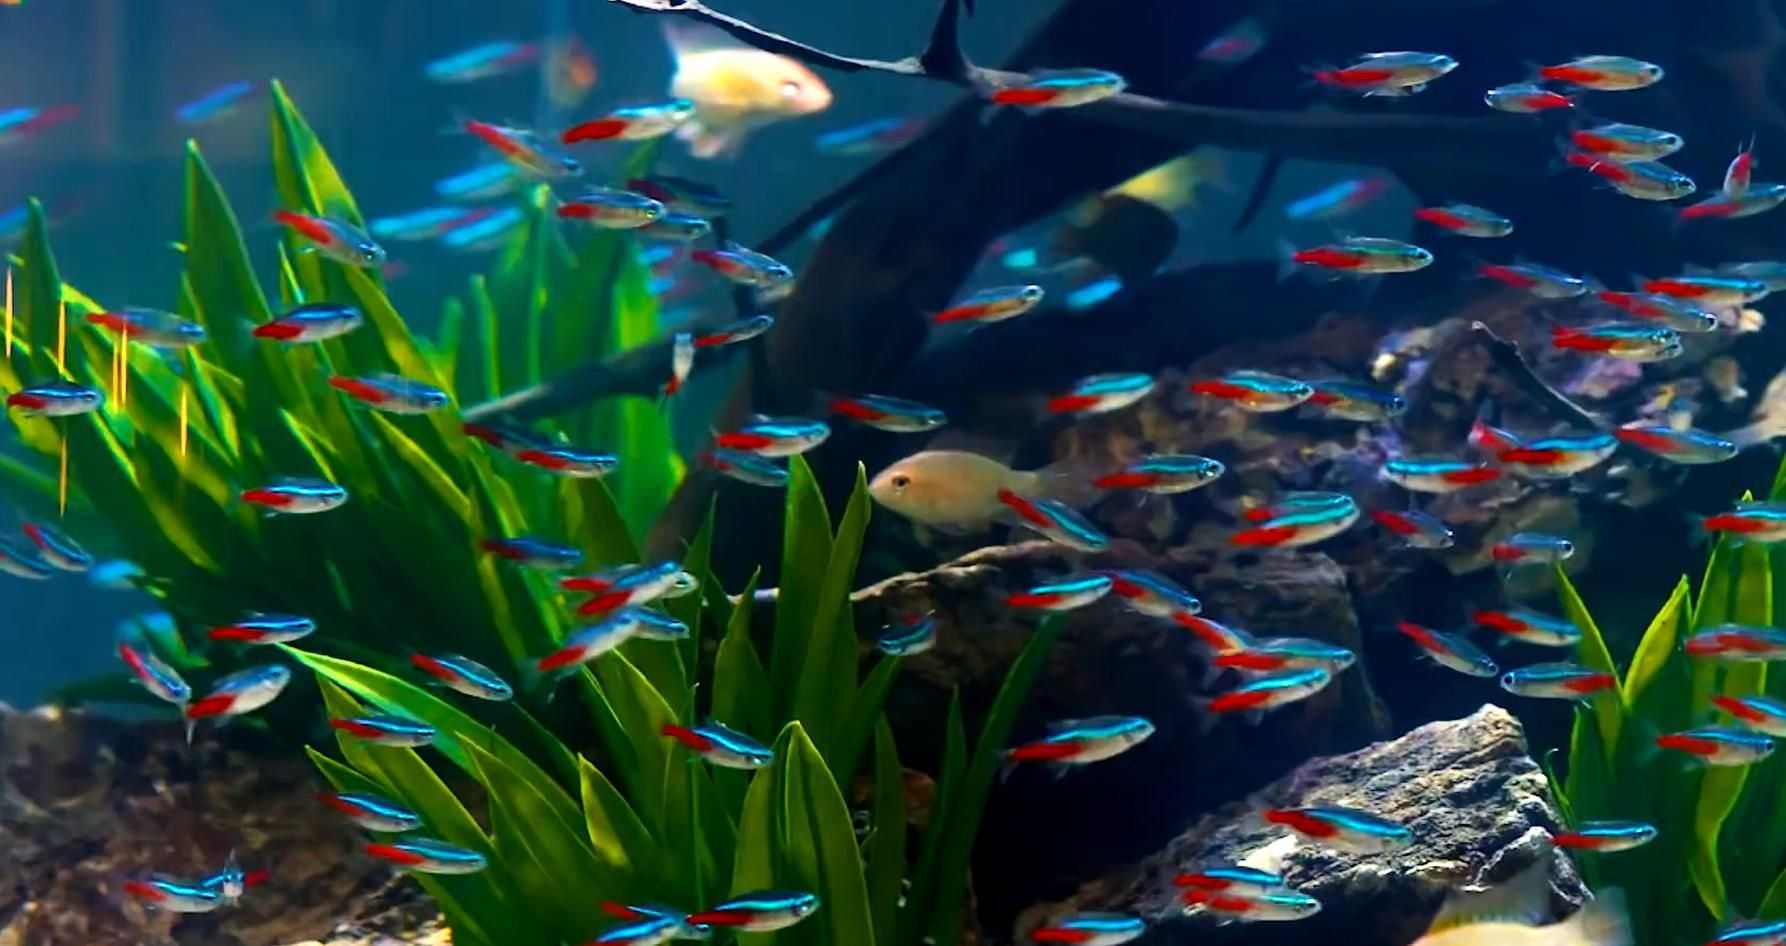 Neon Tetra Fish In Cylinder Aquarium Tetra Fish Neon Tetra Neon Tetra Fish